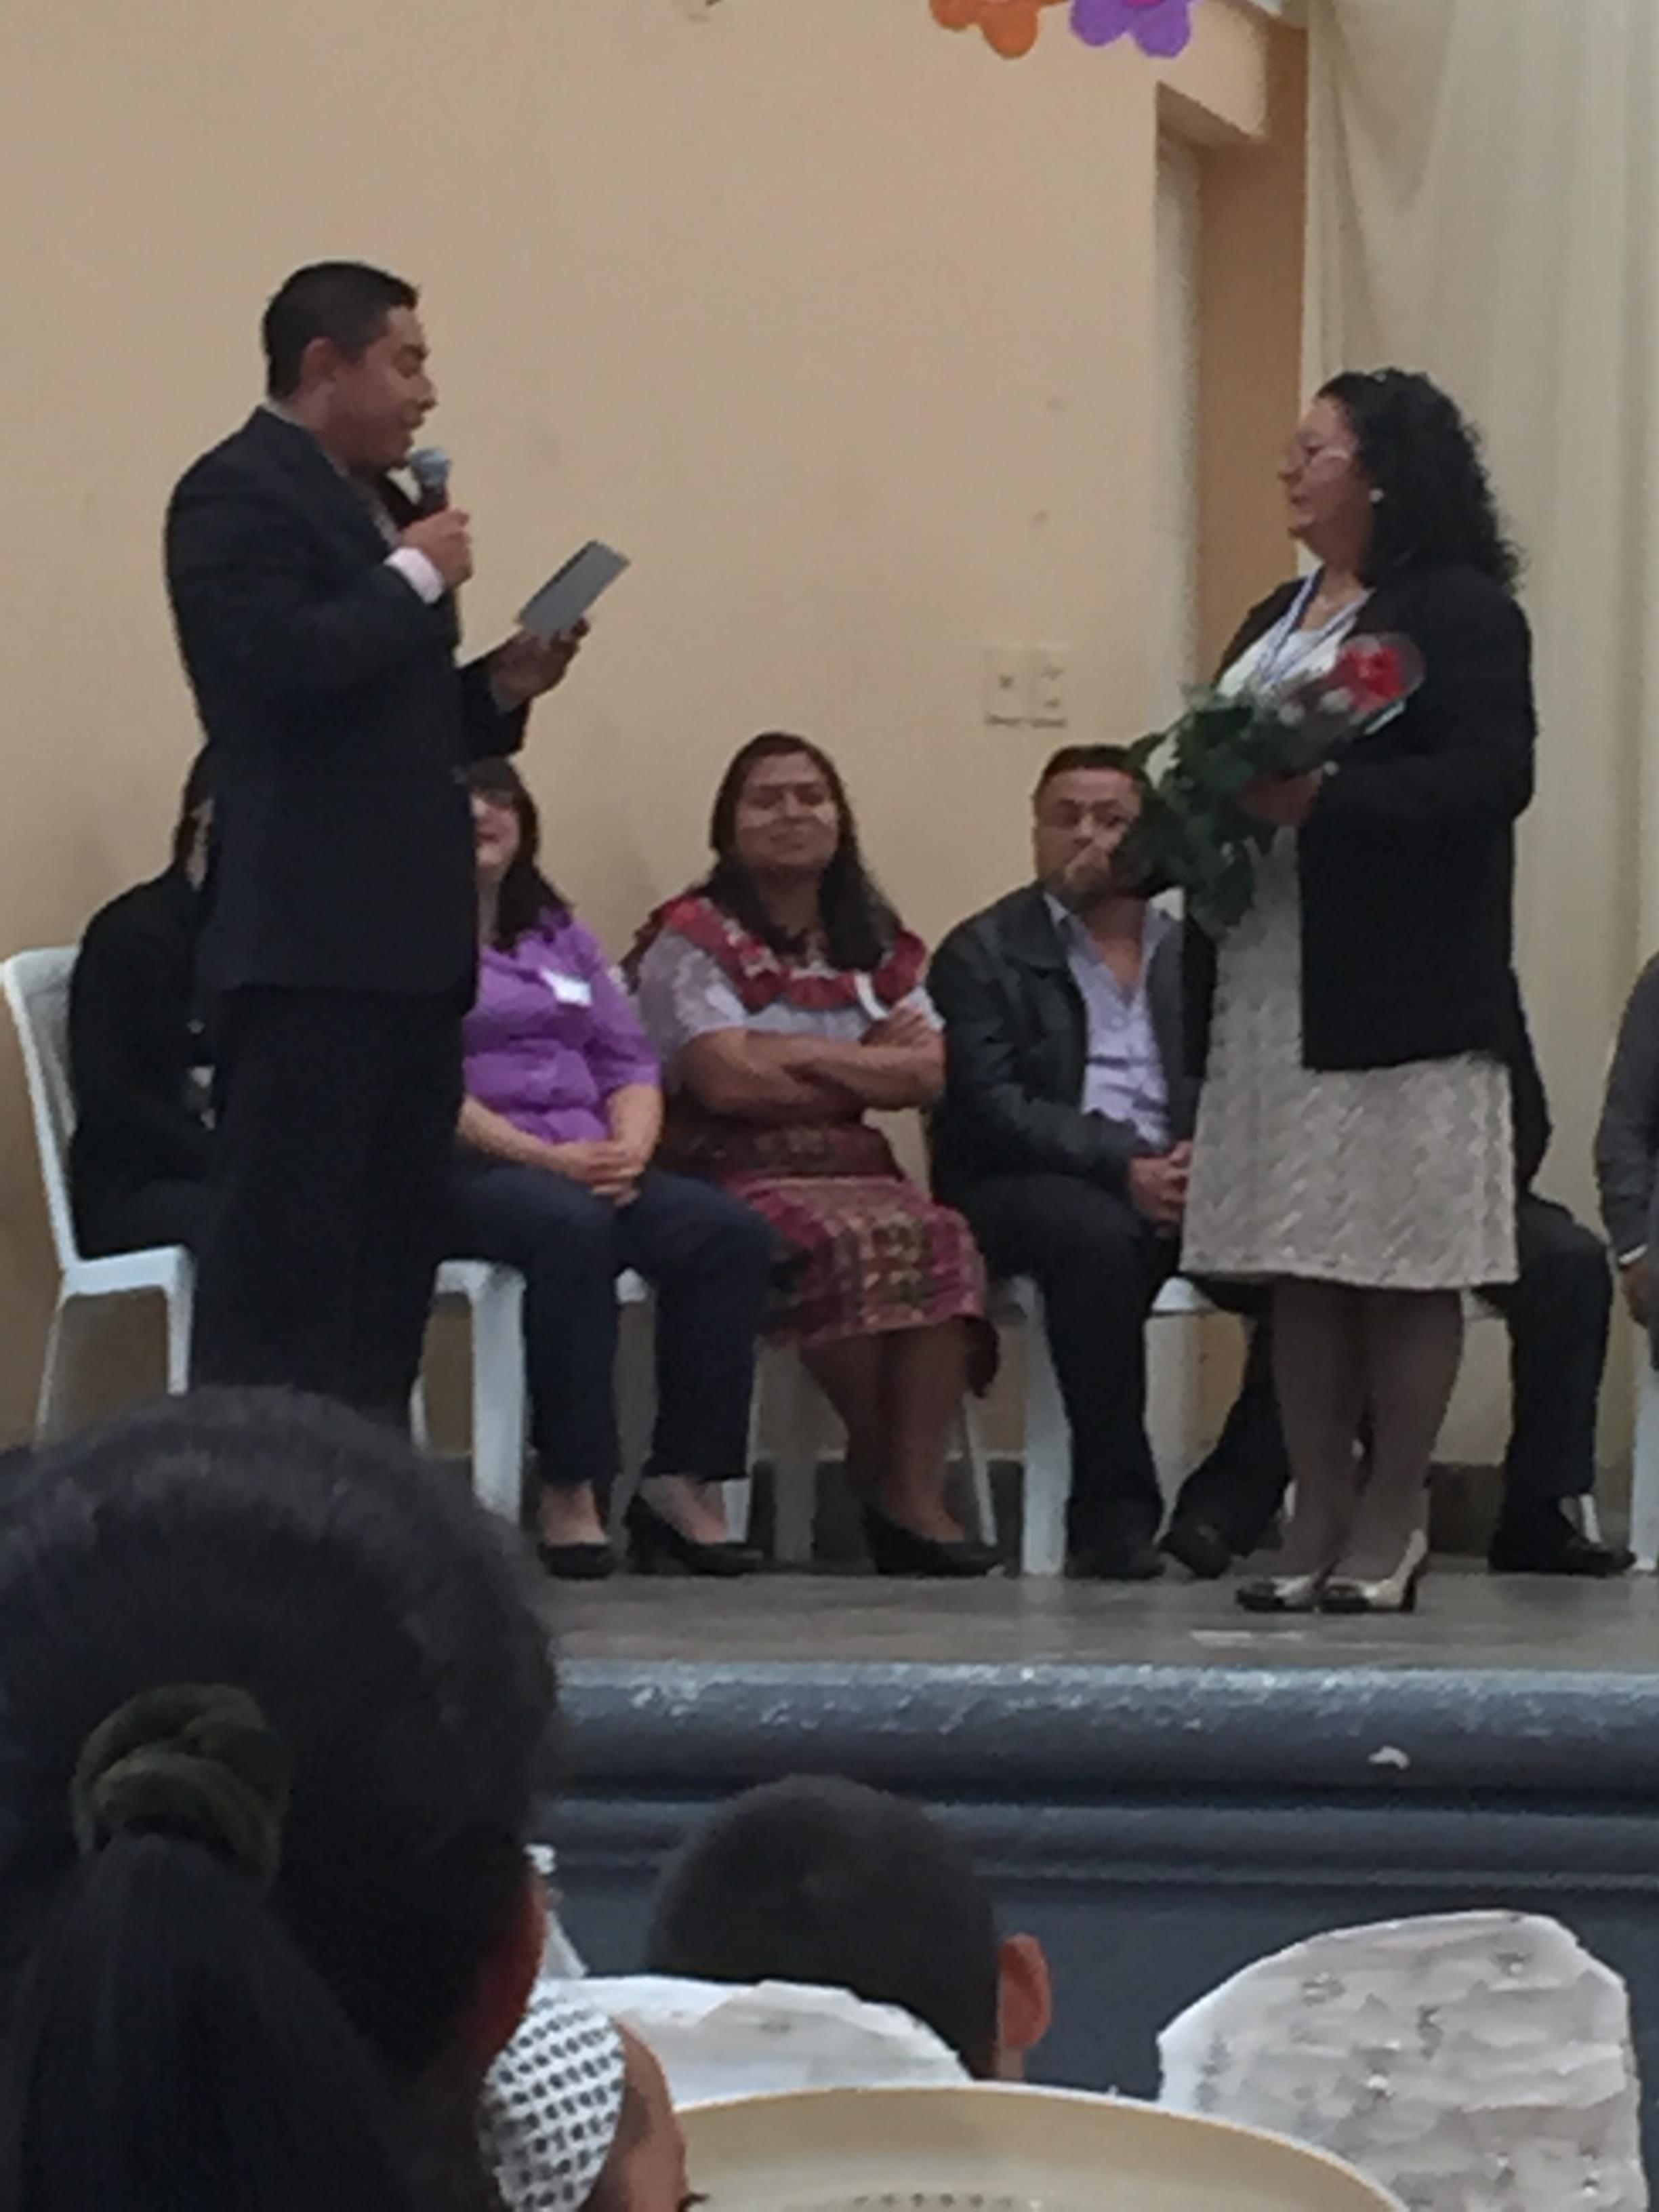 Professor Albert presenting flowers to the Secretary of Education